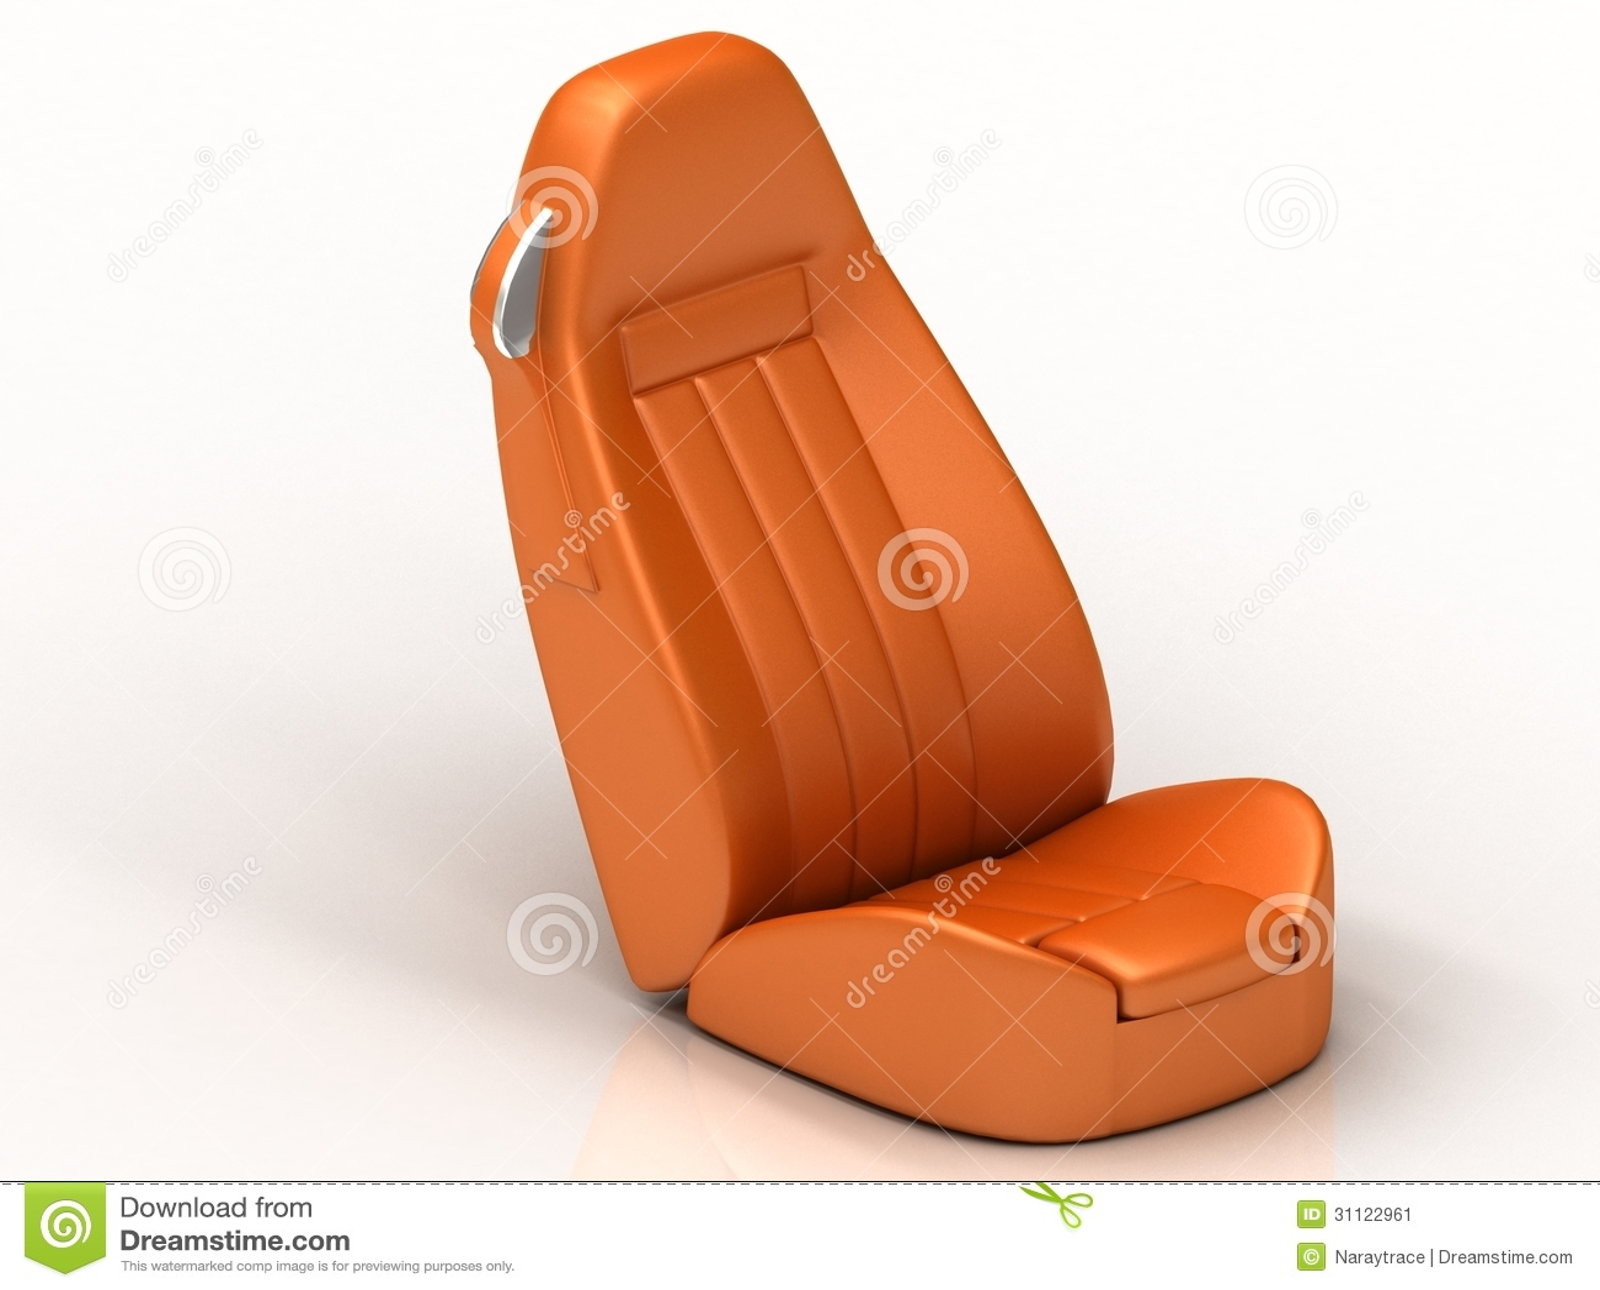 suite orange car seat from the car stock image image 31122961. Black Bedroom Furniture Sets. Home Design Ideas